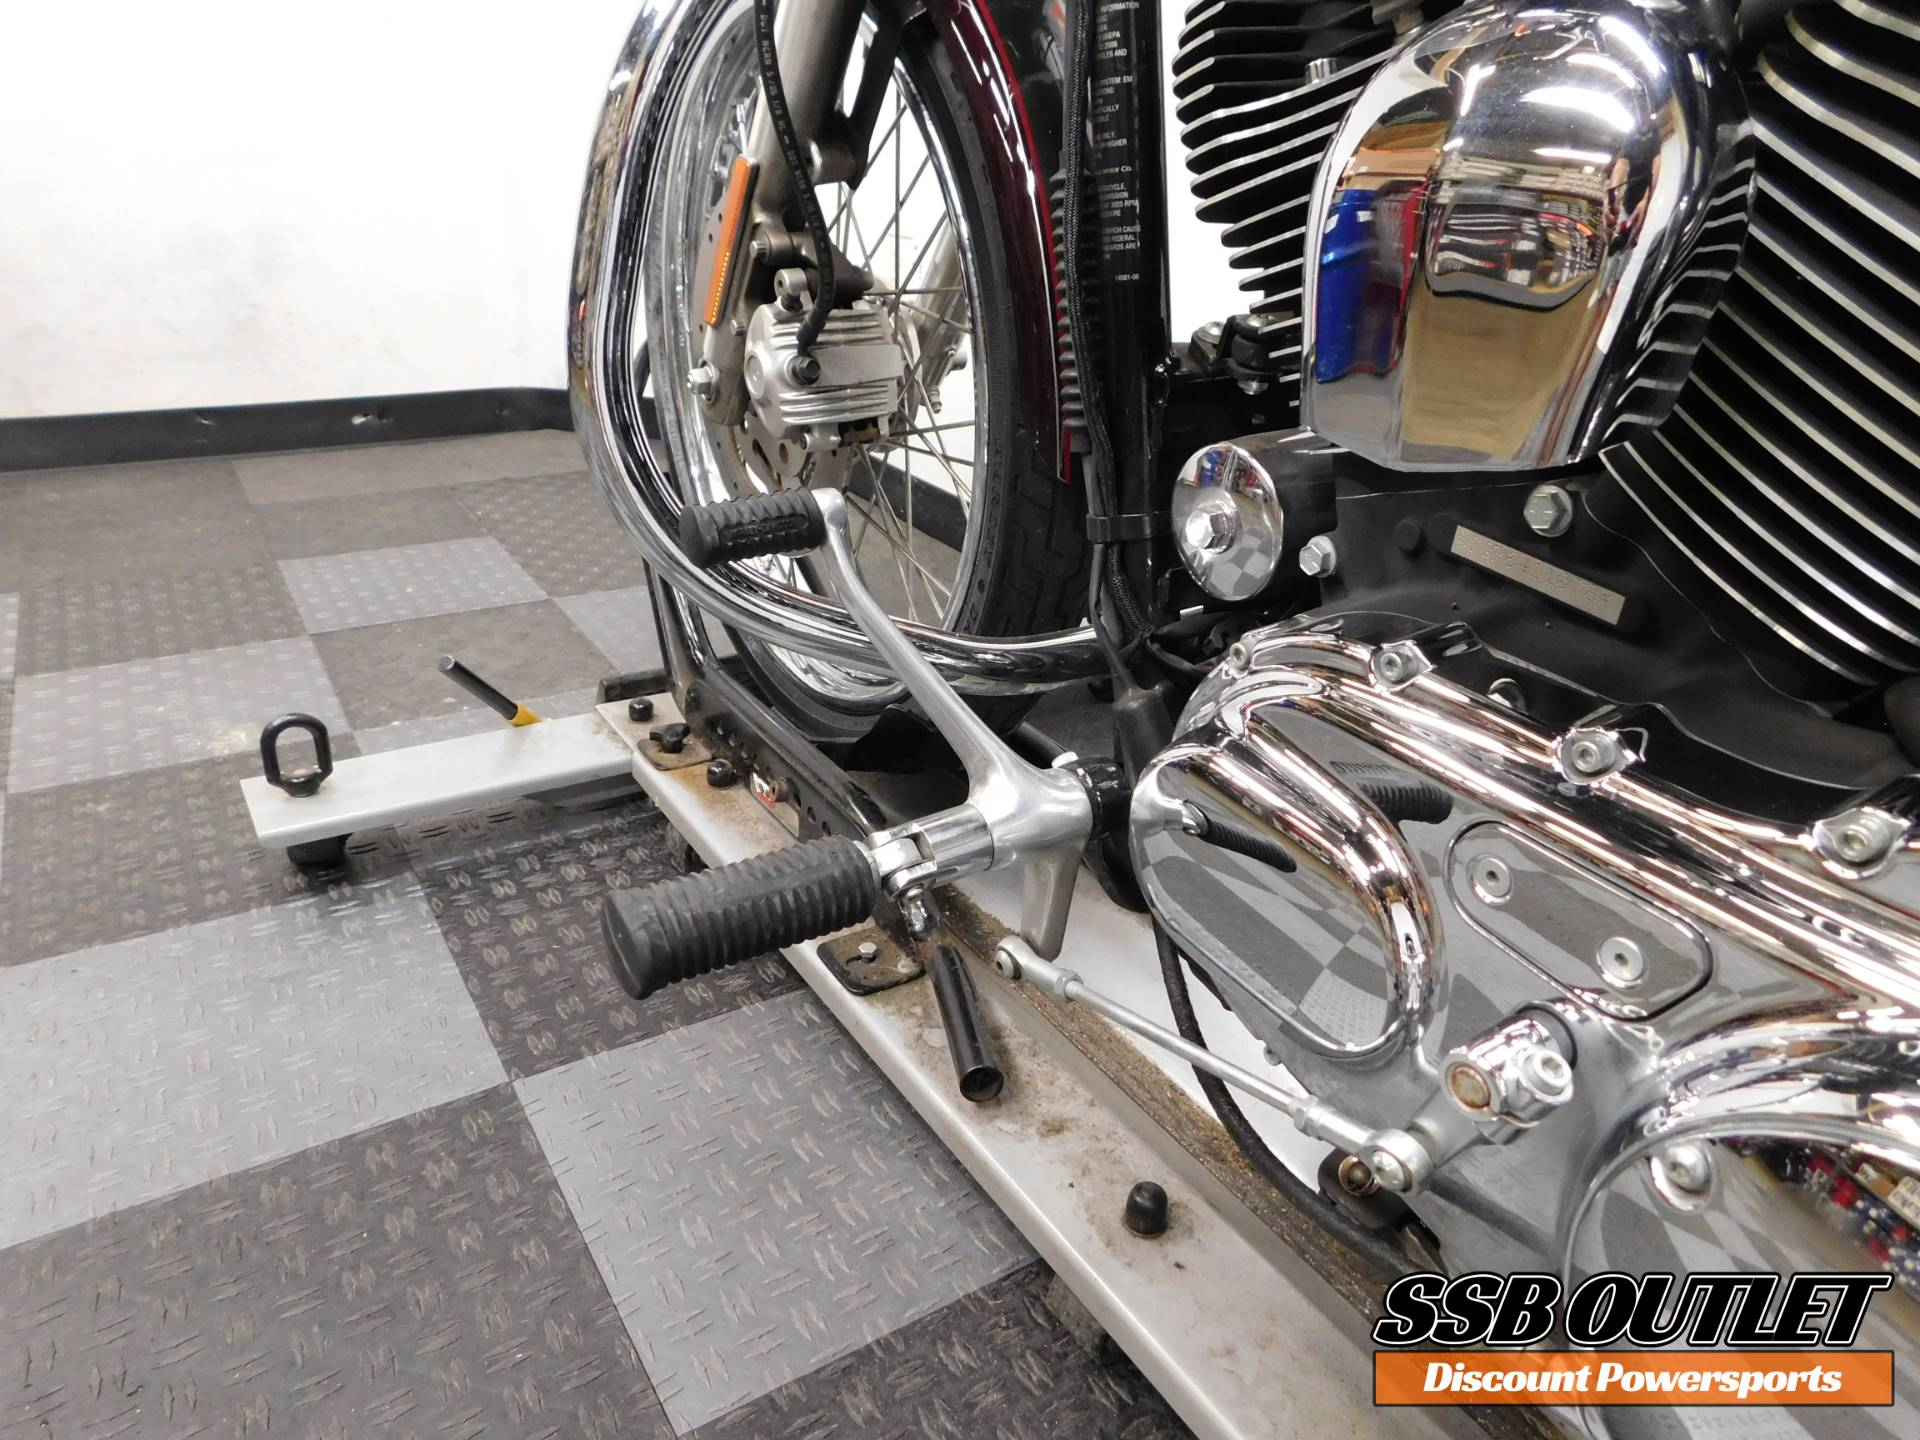 2006 Harley-Davidson Sportster 1200 Custom 8